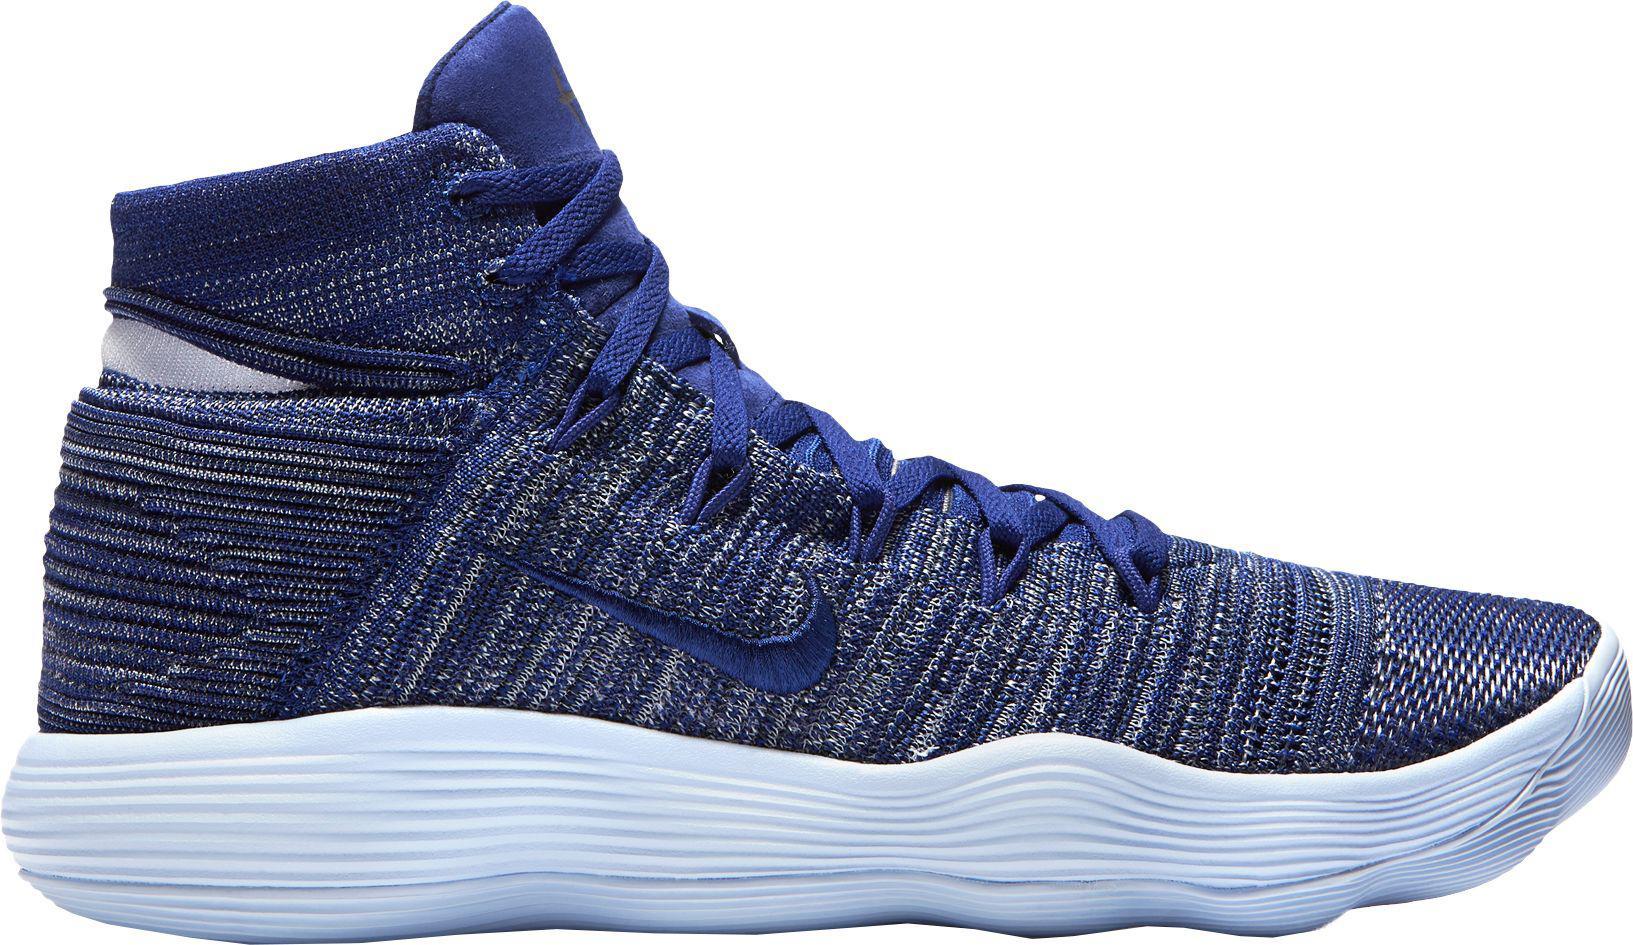 d0f3679b816aad Nike - Blue React Hyperdunk 2017 Flyknit Basketball Shoes for Men - Lyst